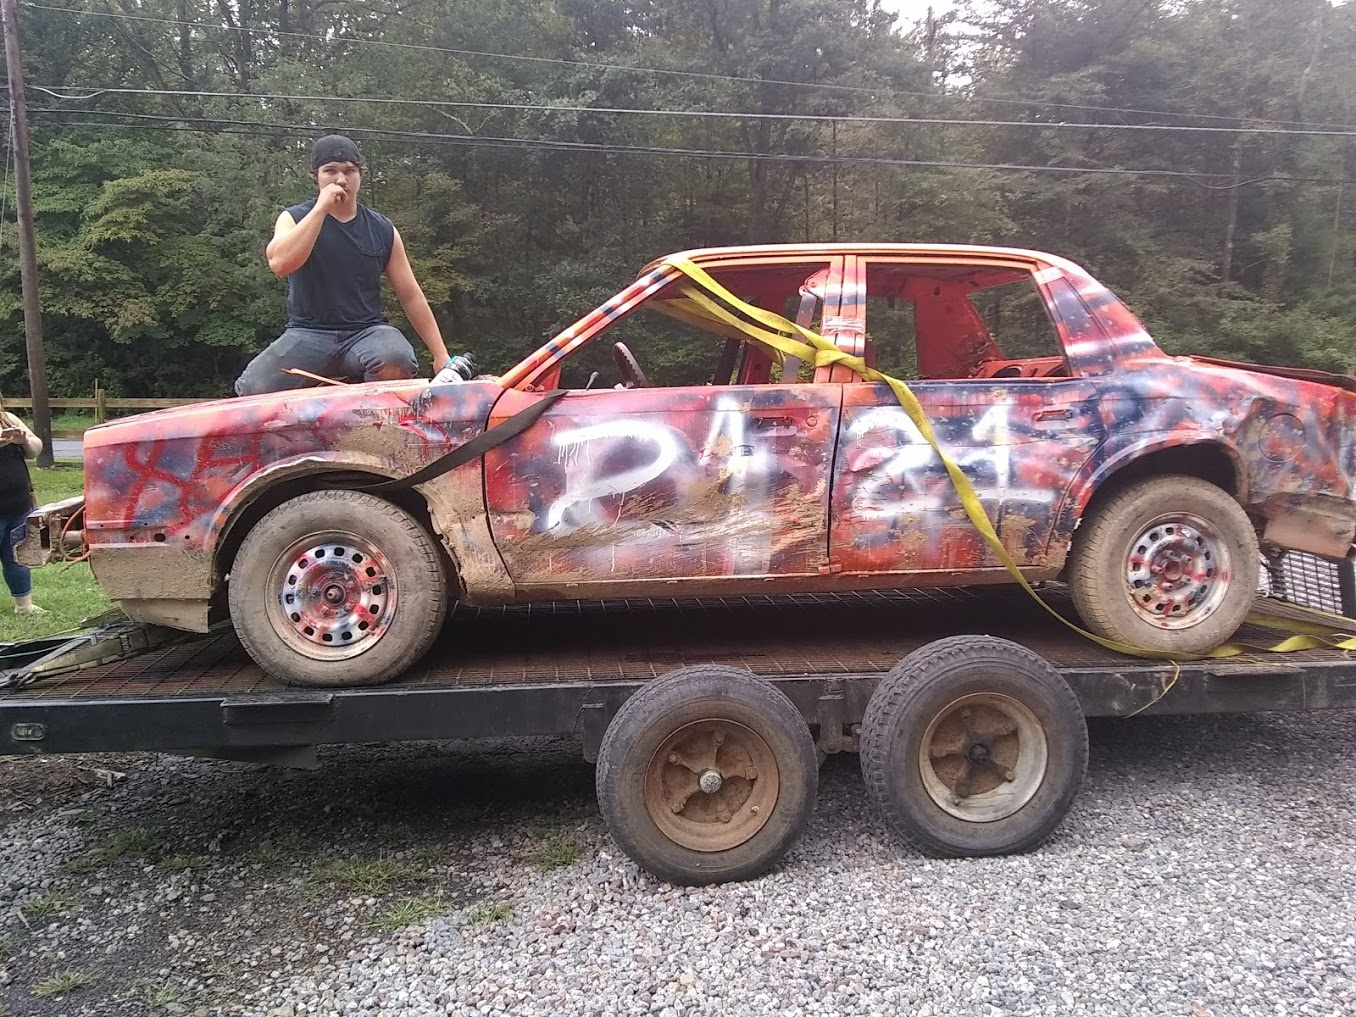 Senior Noah Brittenburg poses with his demolition racing car.